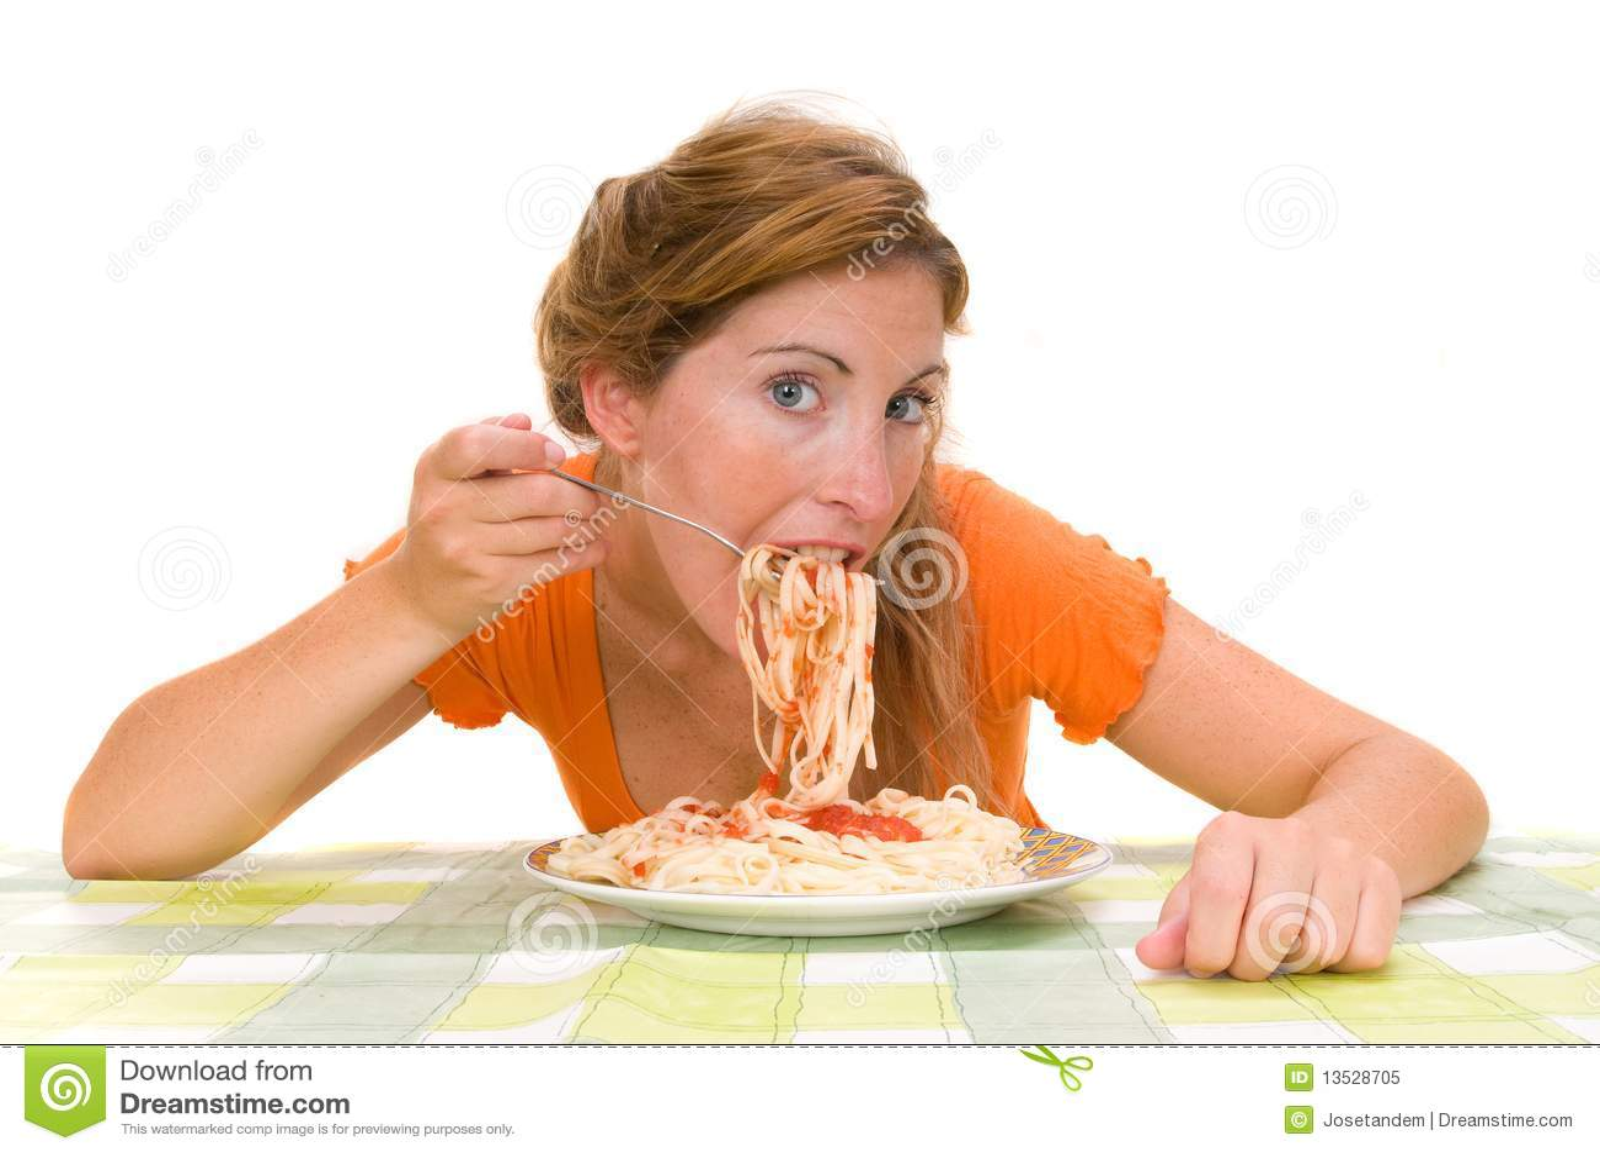 Woman Eating Spaghetti Royalty Free Stock Photo - Image: 13528705